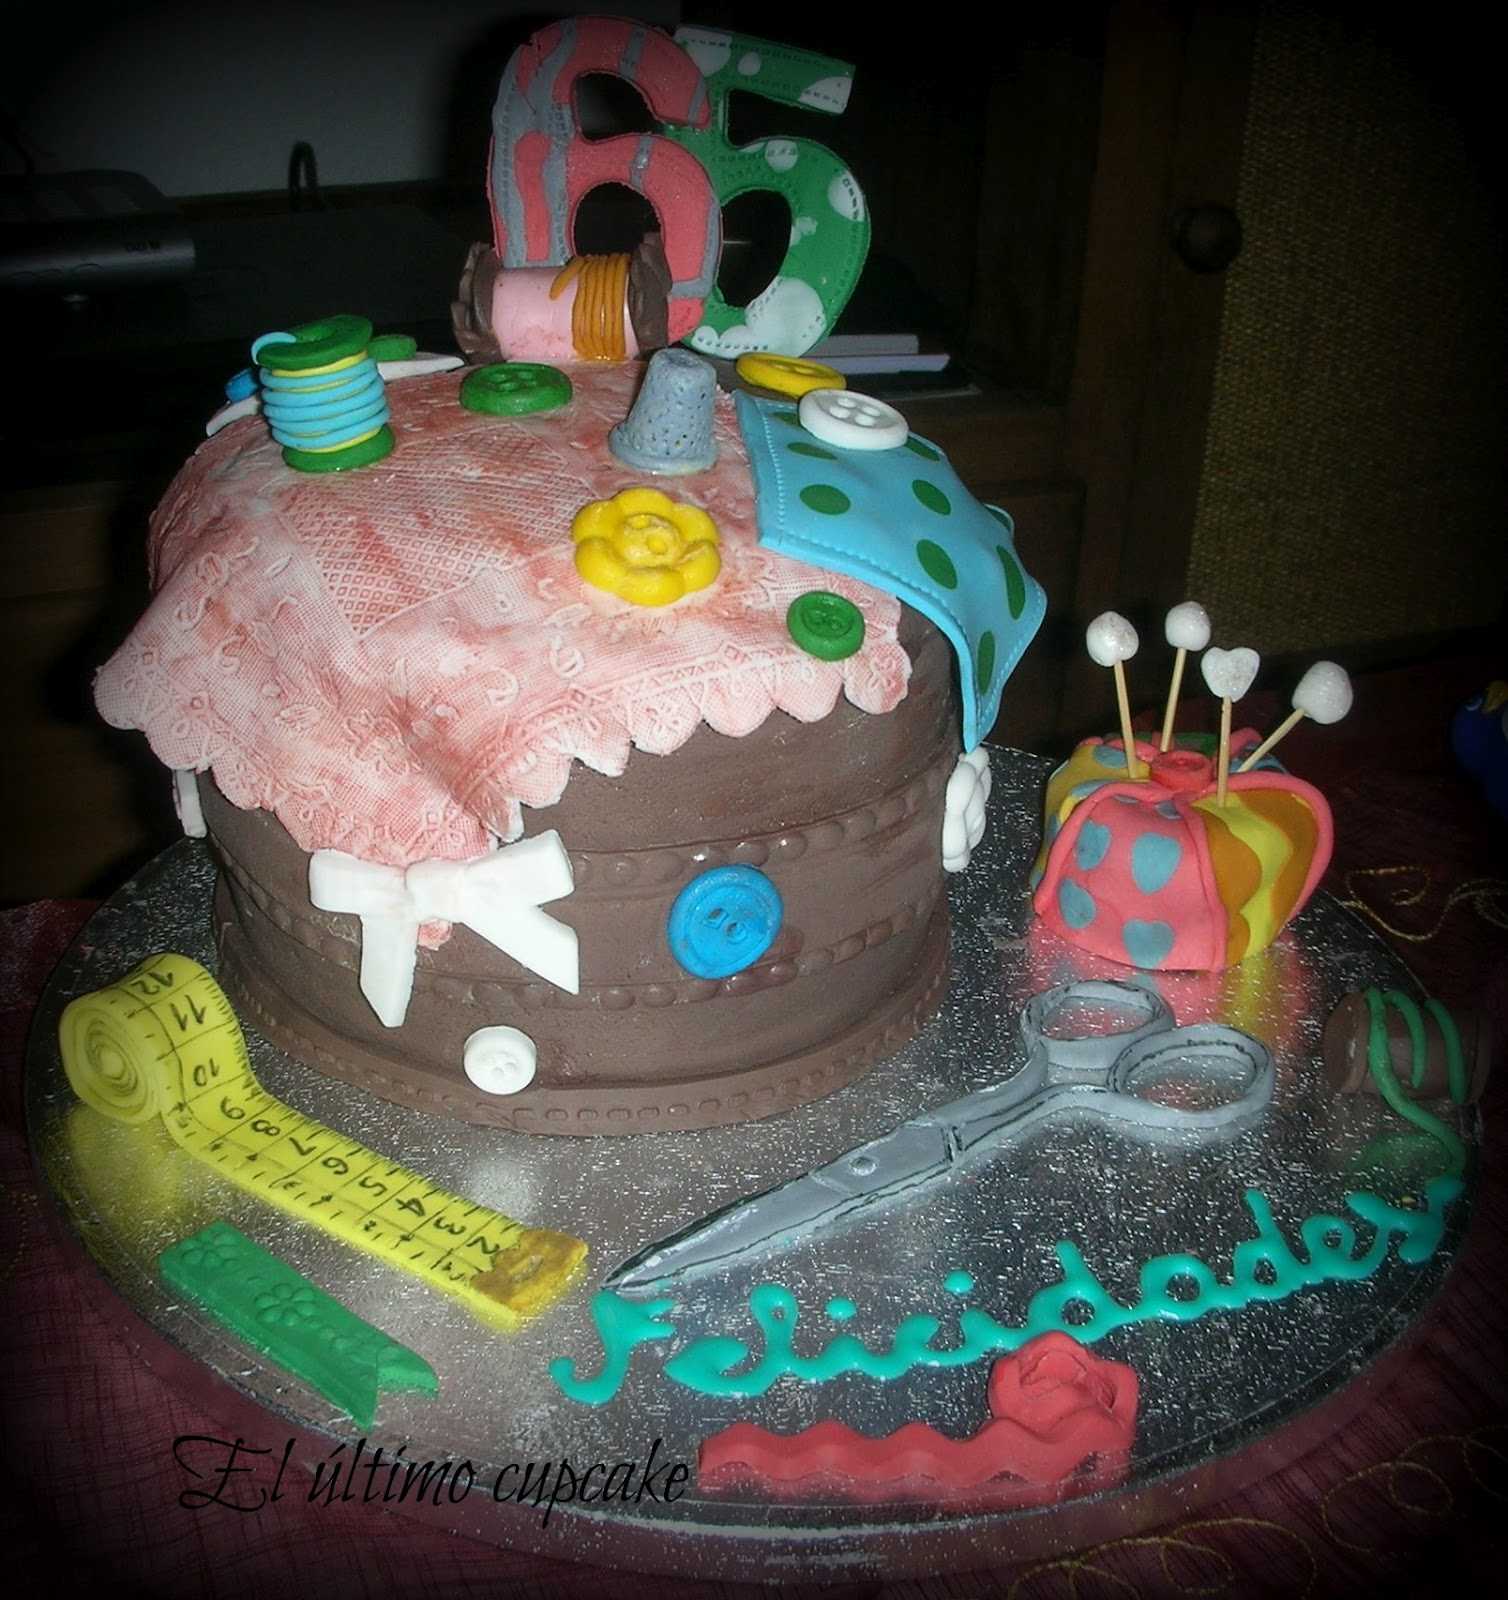 Receta de Funnel cake - RecetasGratisnet